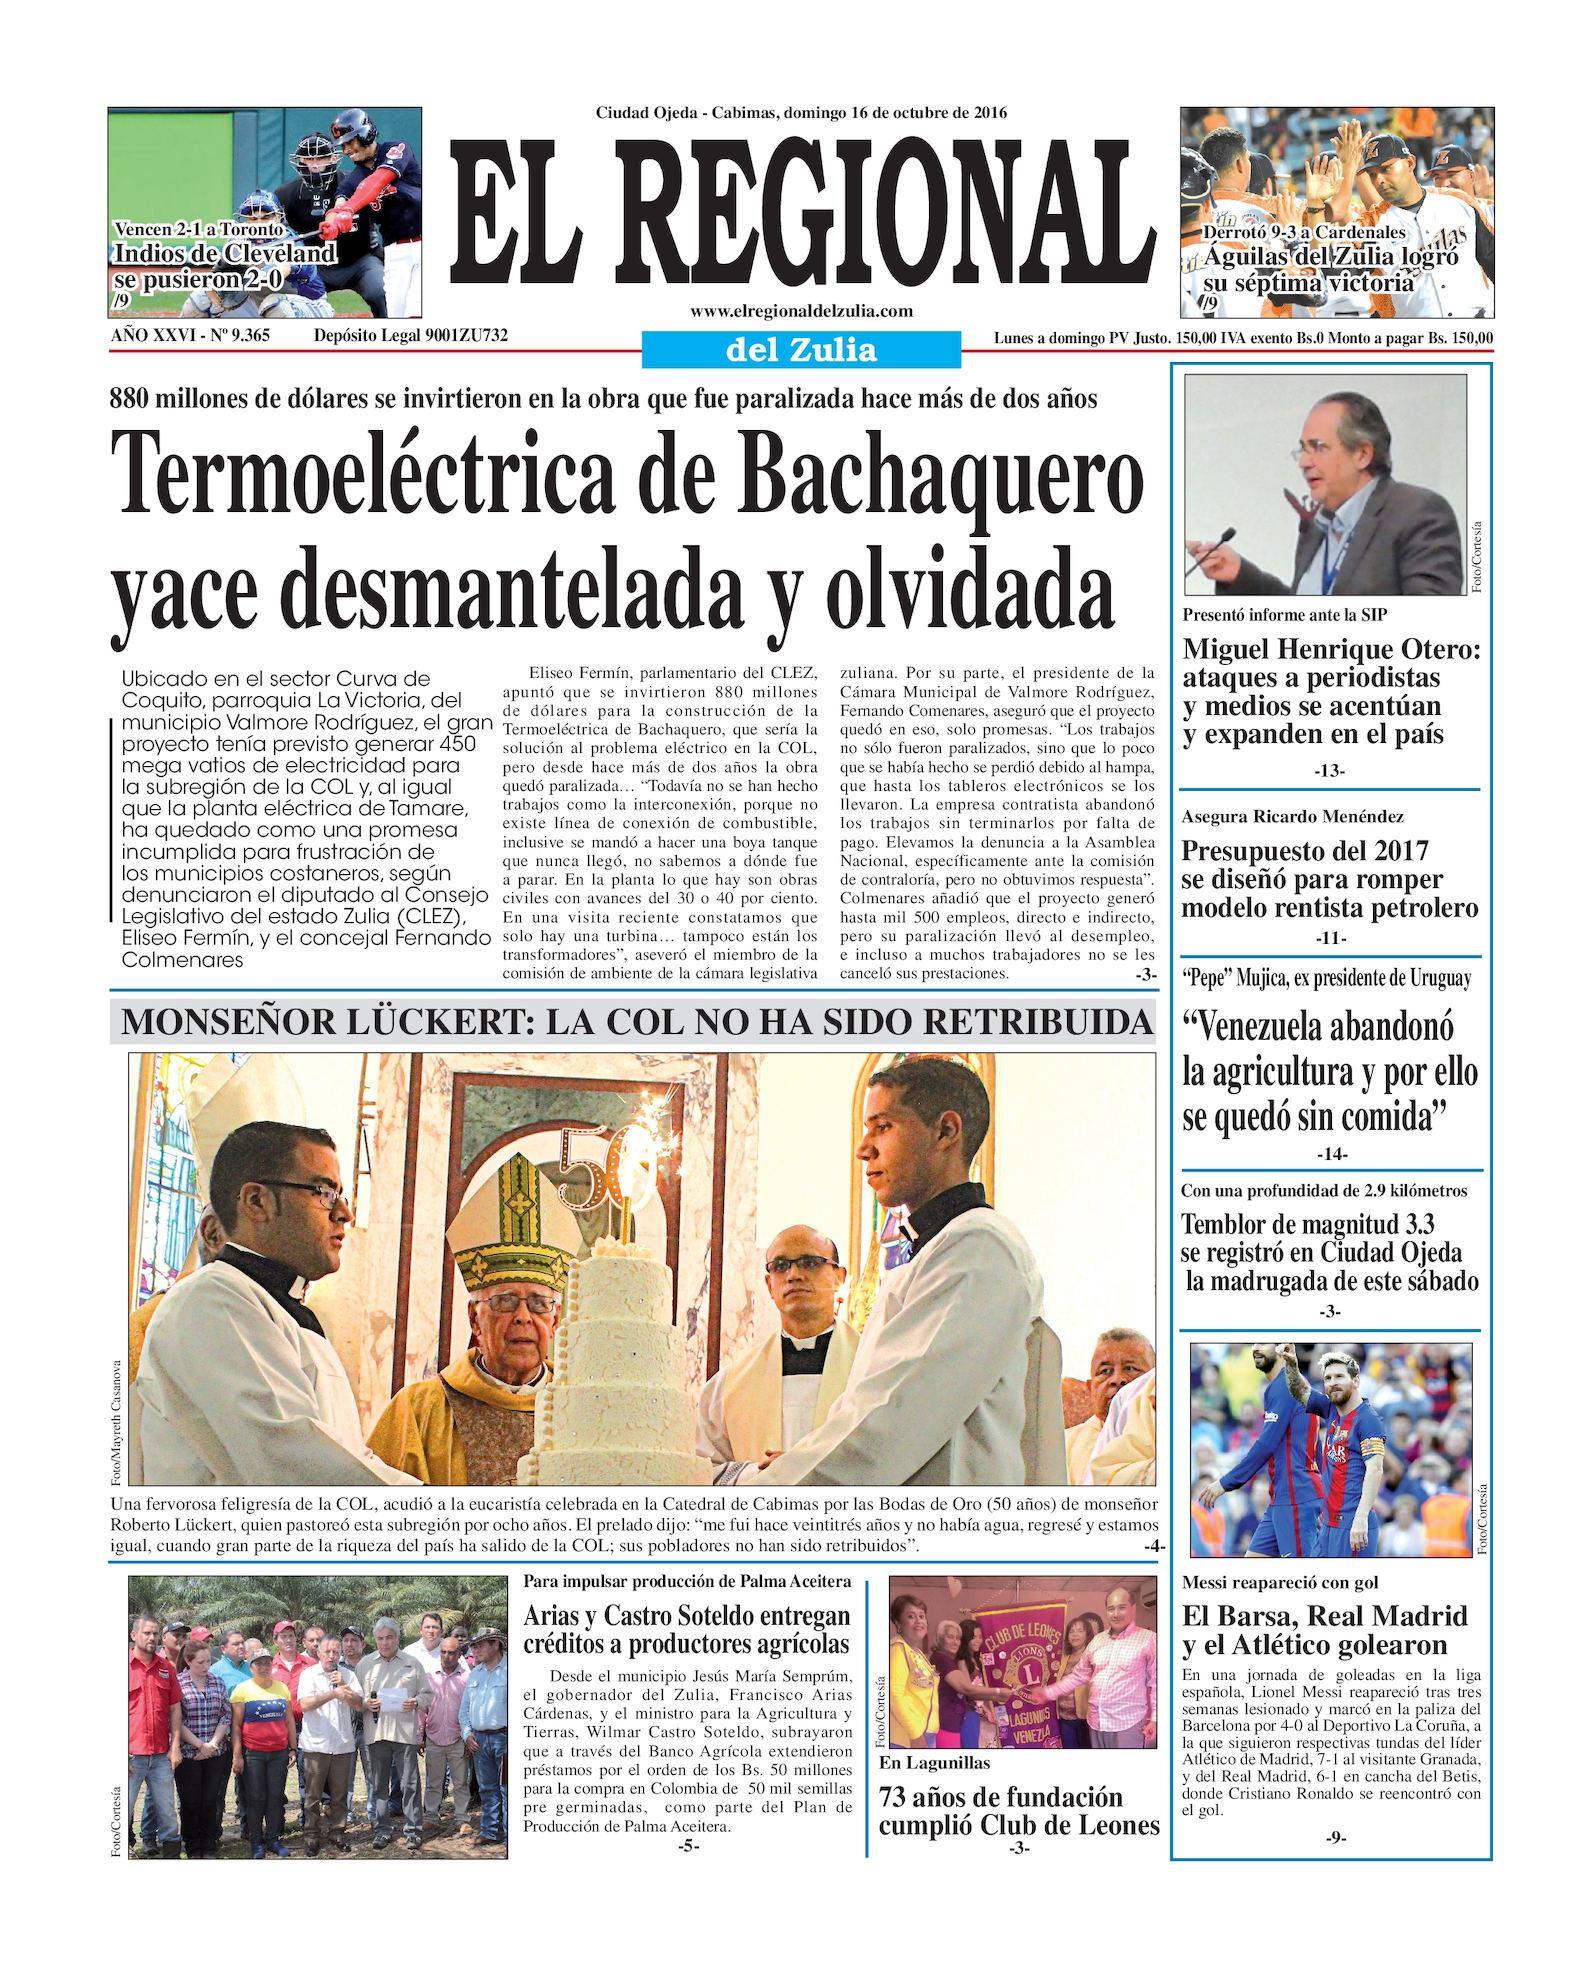 Calaméo - El Regional del Zulia 16-10-2016